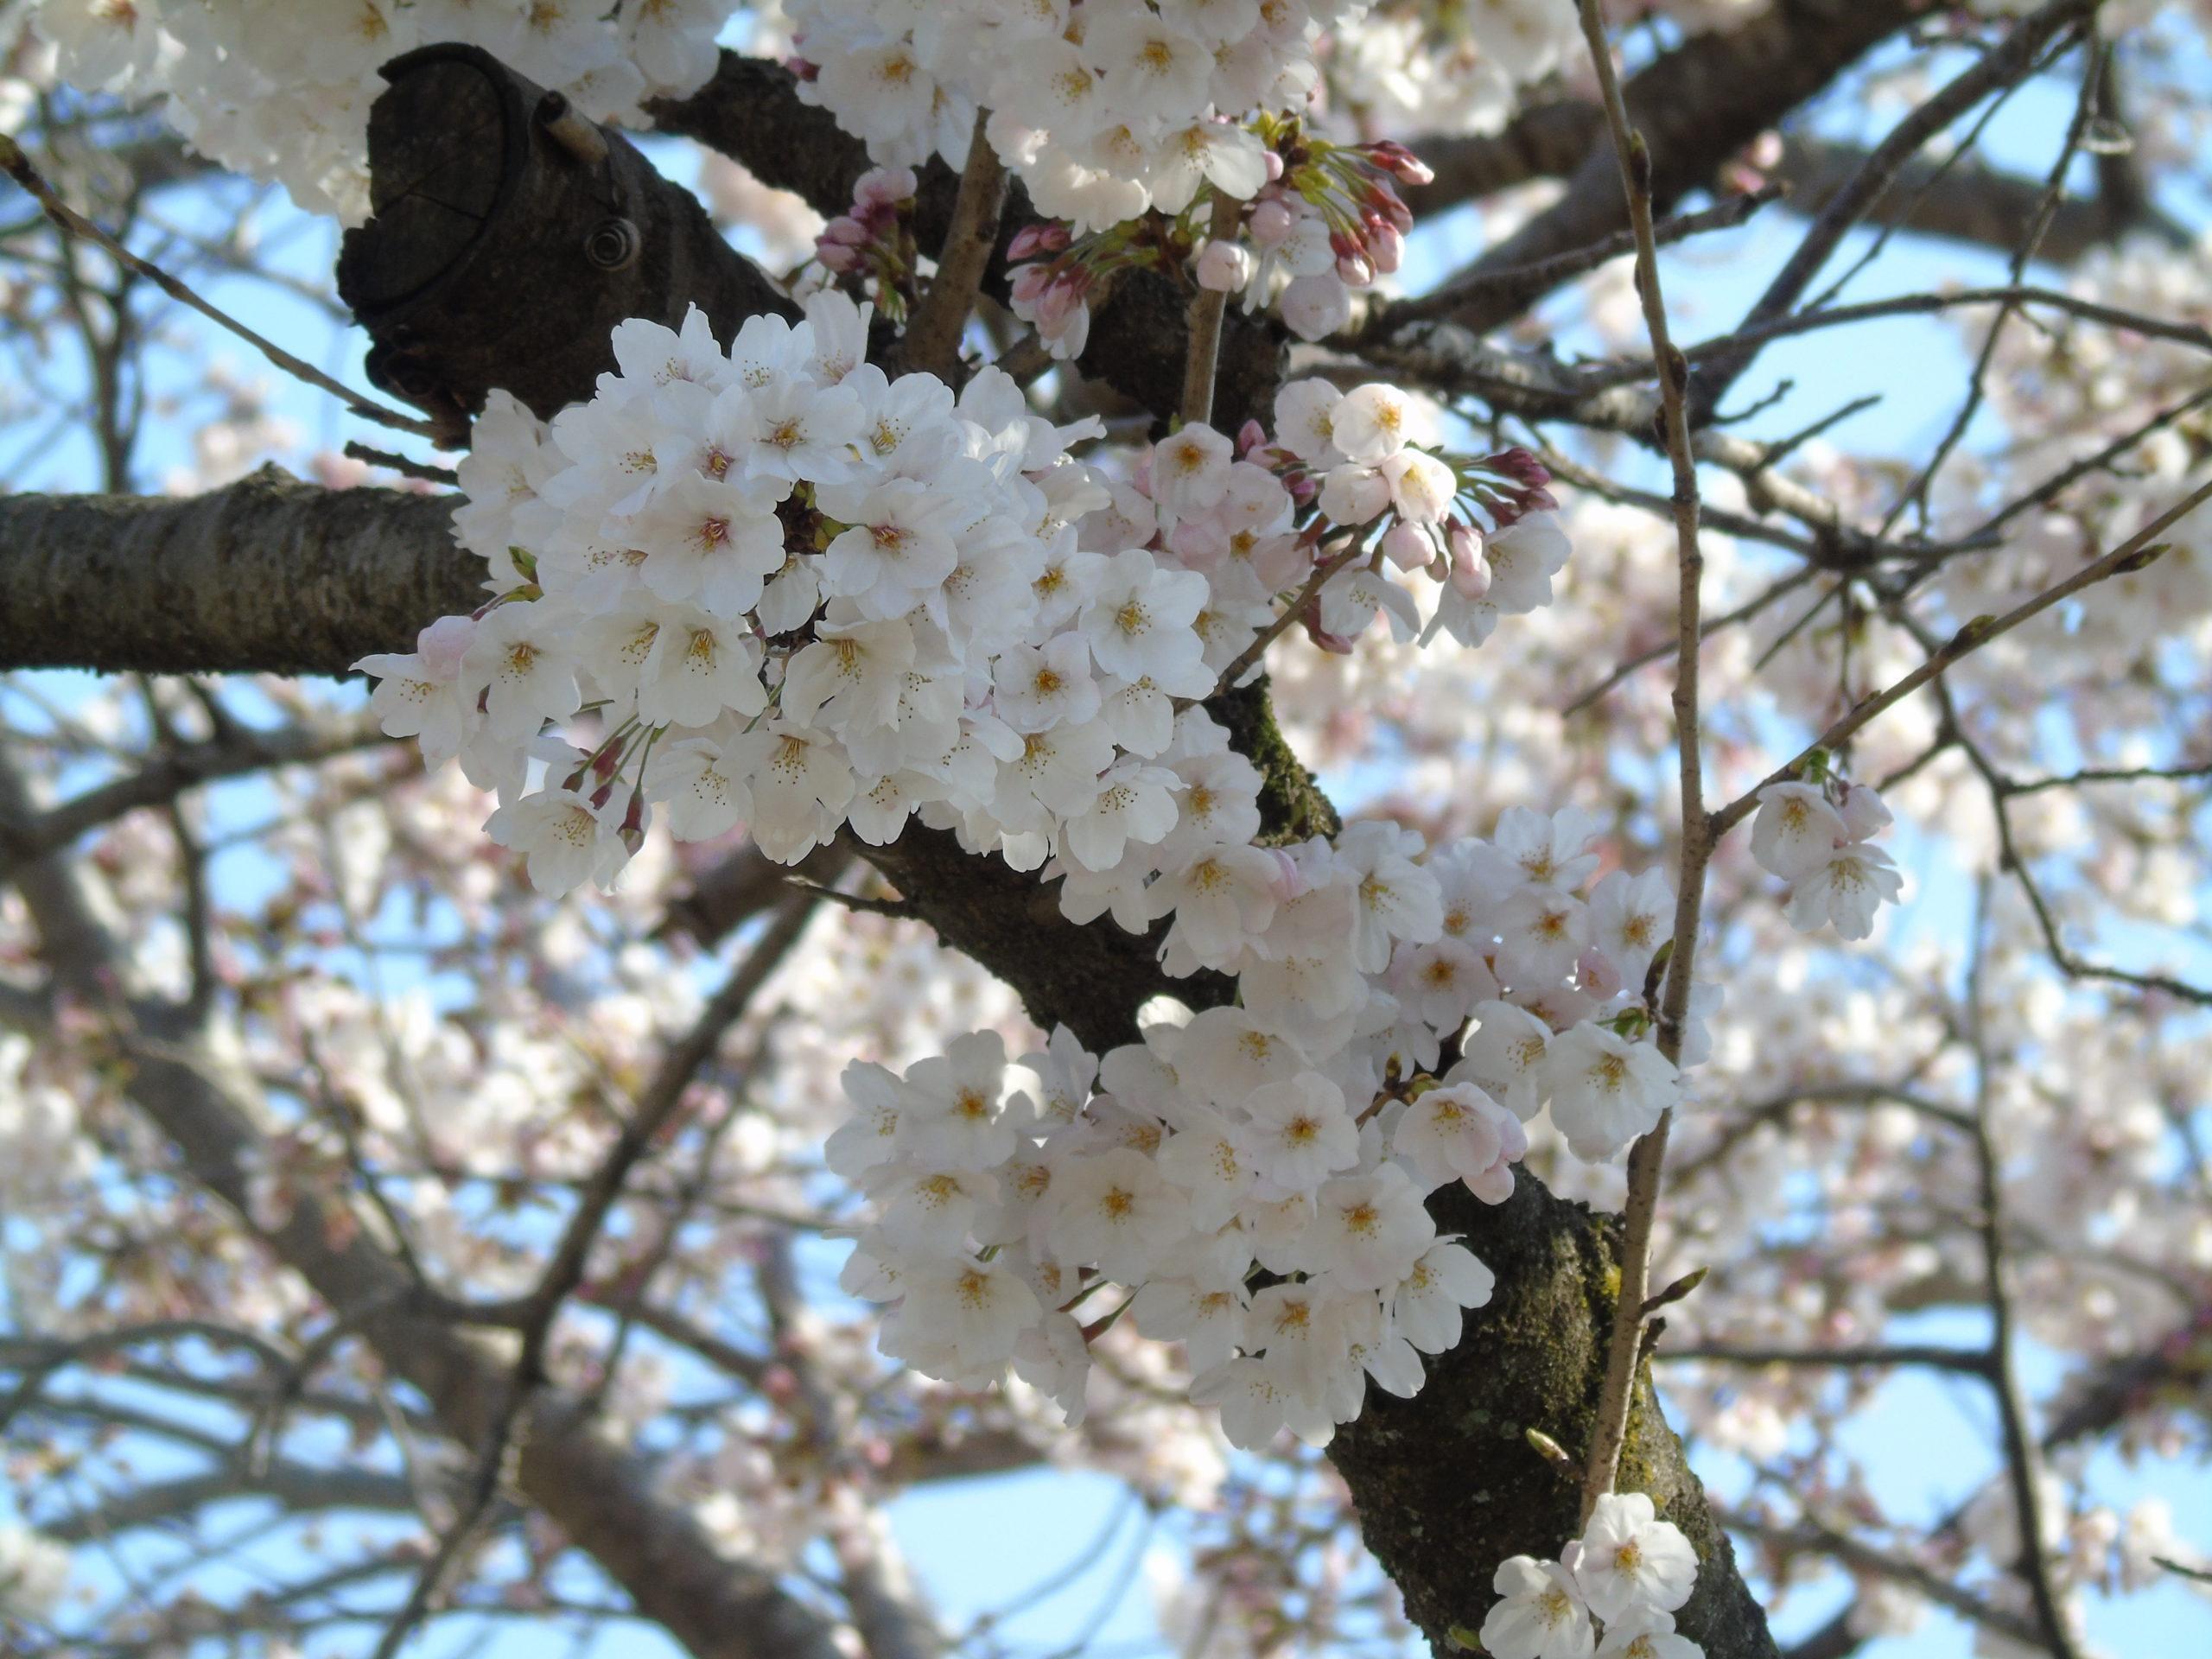 Branche sakura contre plongée zoom